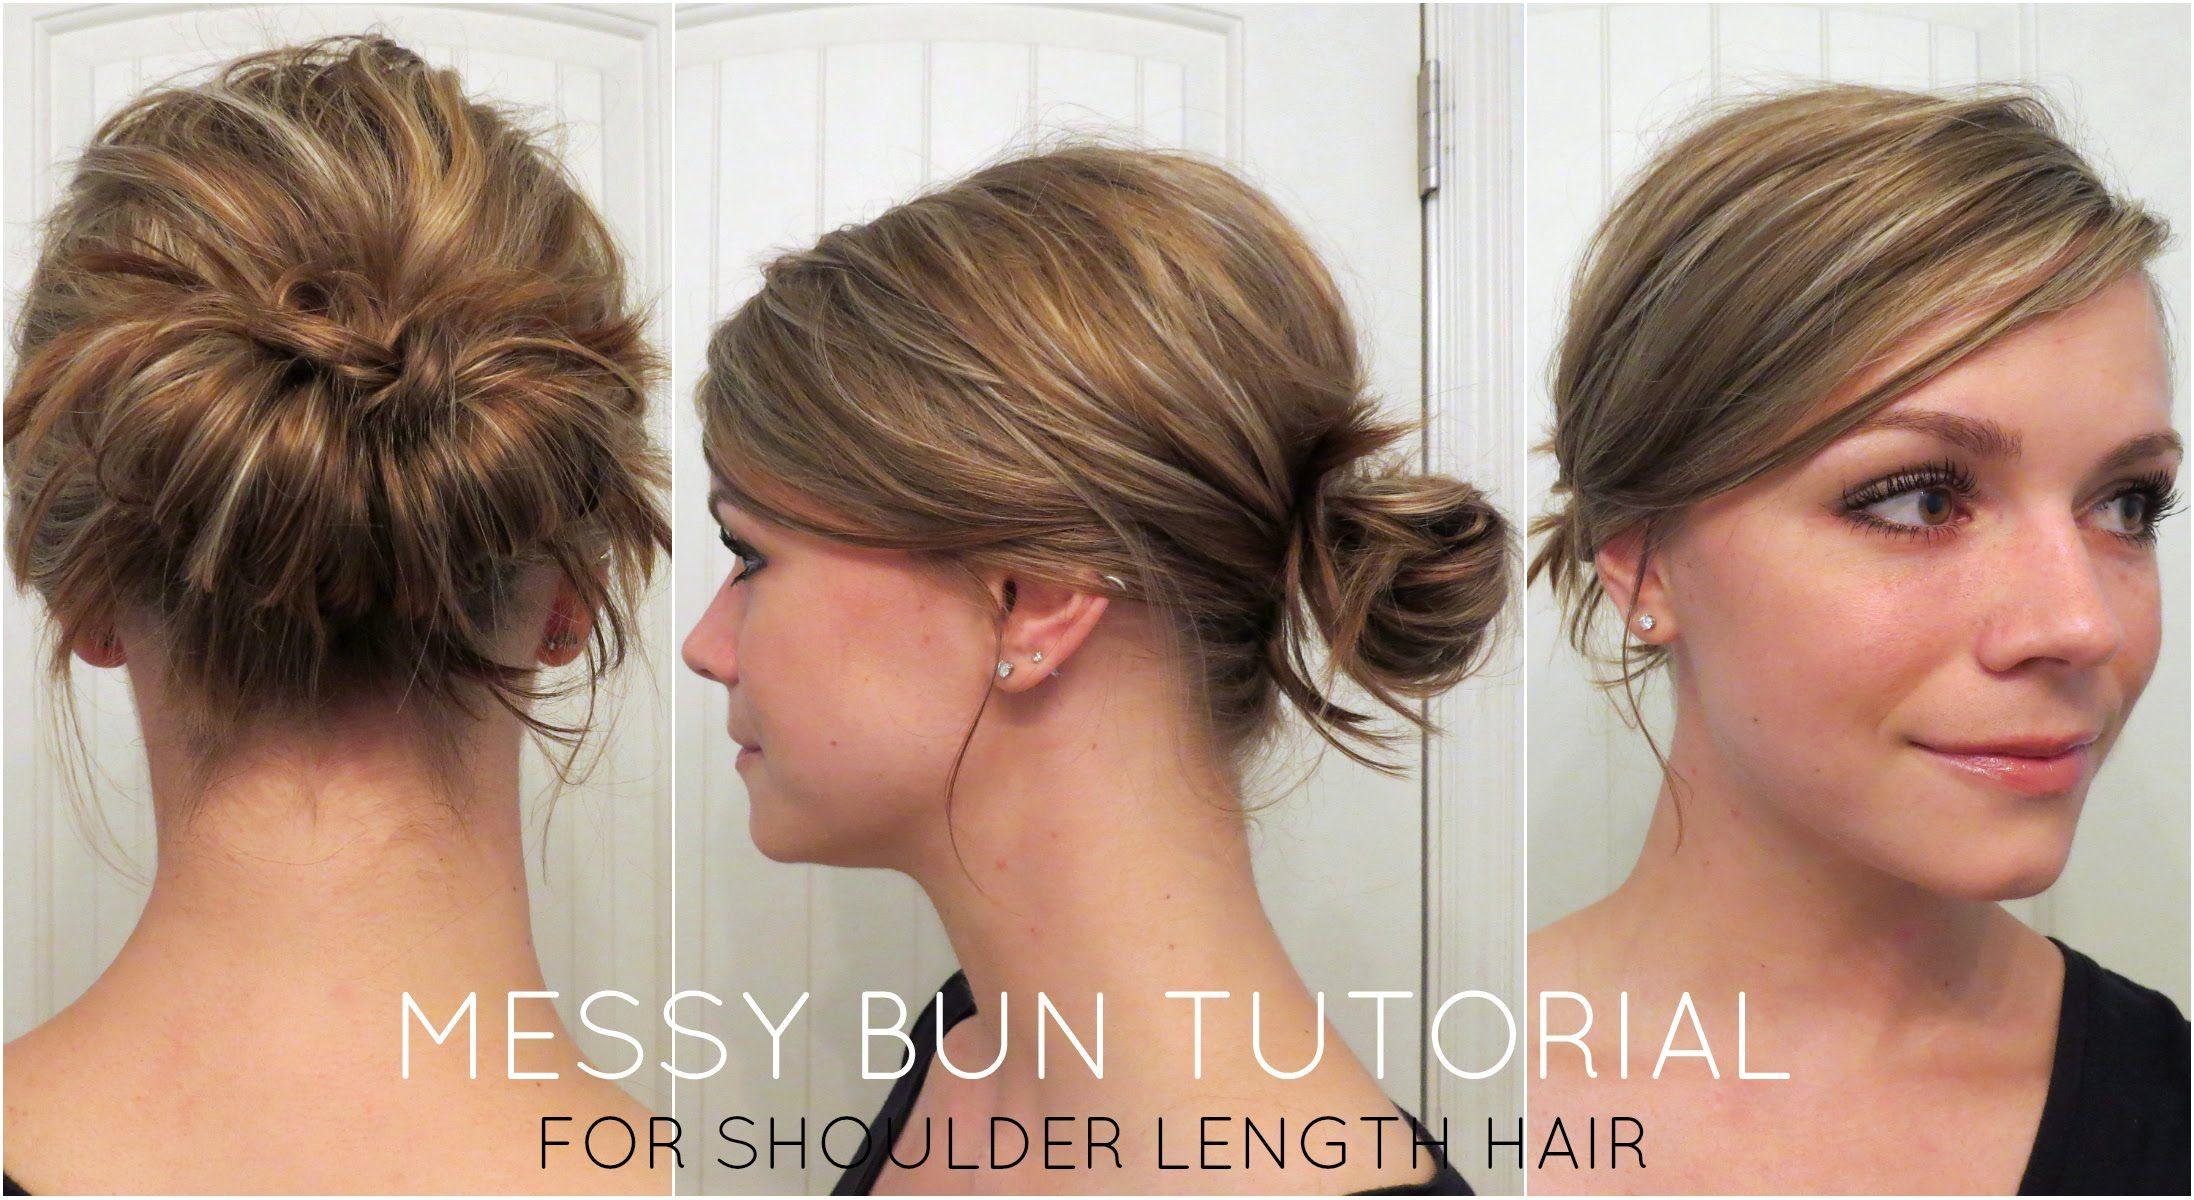 Messy Bun For Shoulder Length Hair Medium Hair Styles Shoulder Length Hair Hair Lengths